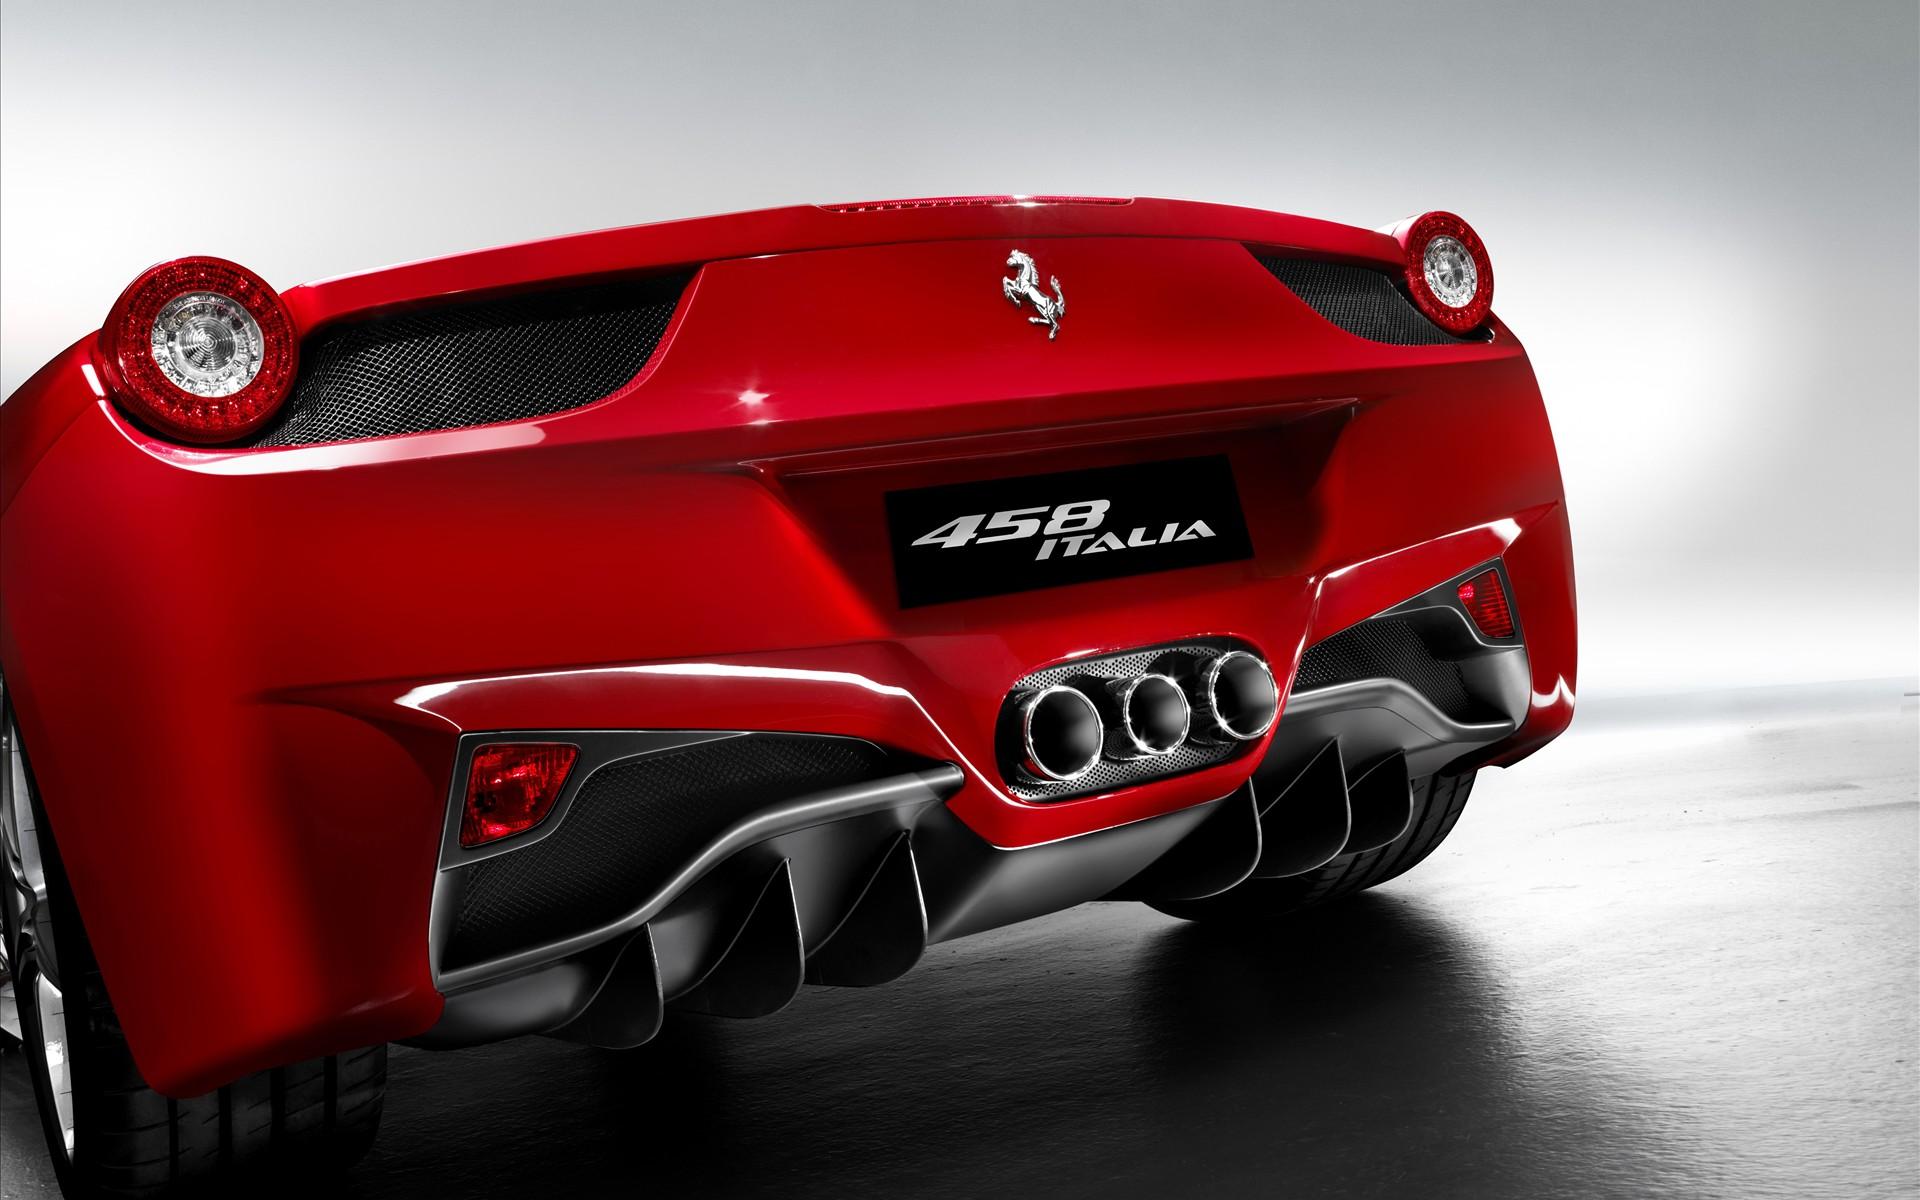 http://4.bp.blogspot.com/-geDE1y__bEQ/UJy4eOUqZ_I/AAAAAAAAGXY/quZMU5twWLE/s4000/Ferrari_458_Italia_widescreen_wallpapers_07_1920x1200.jpg